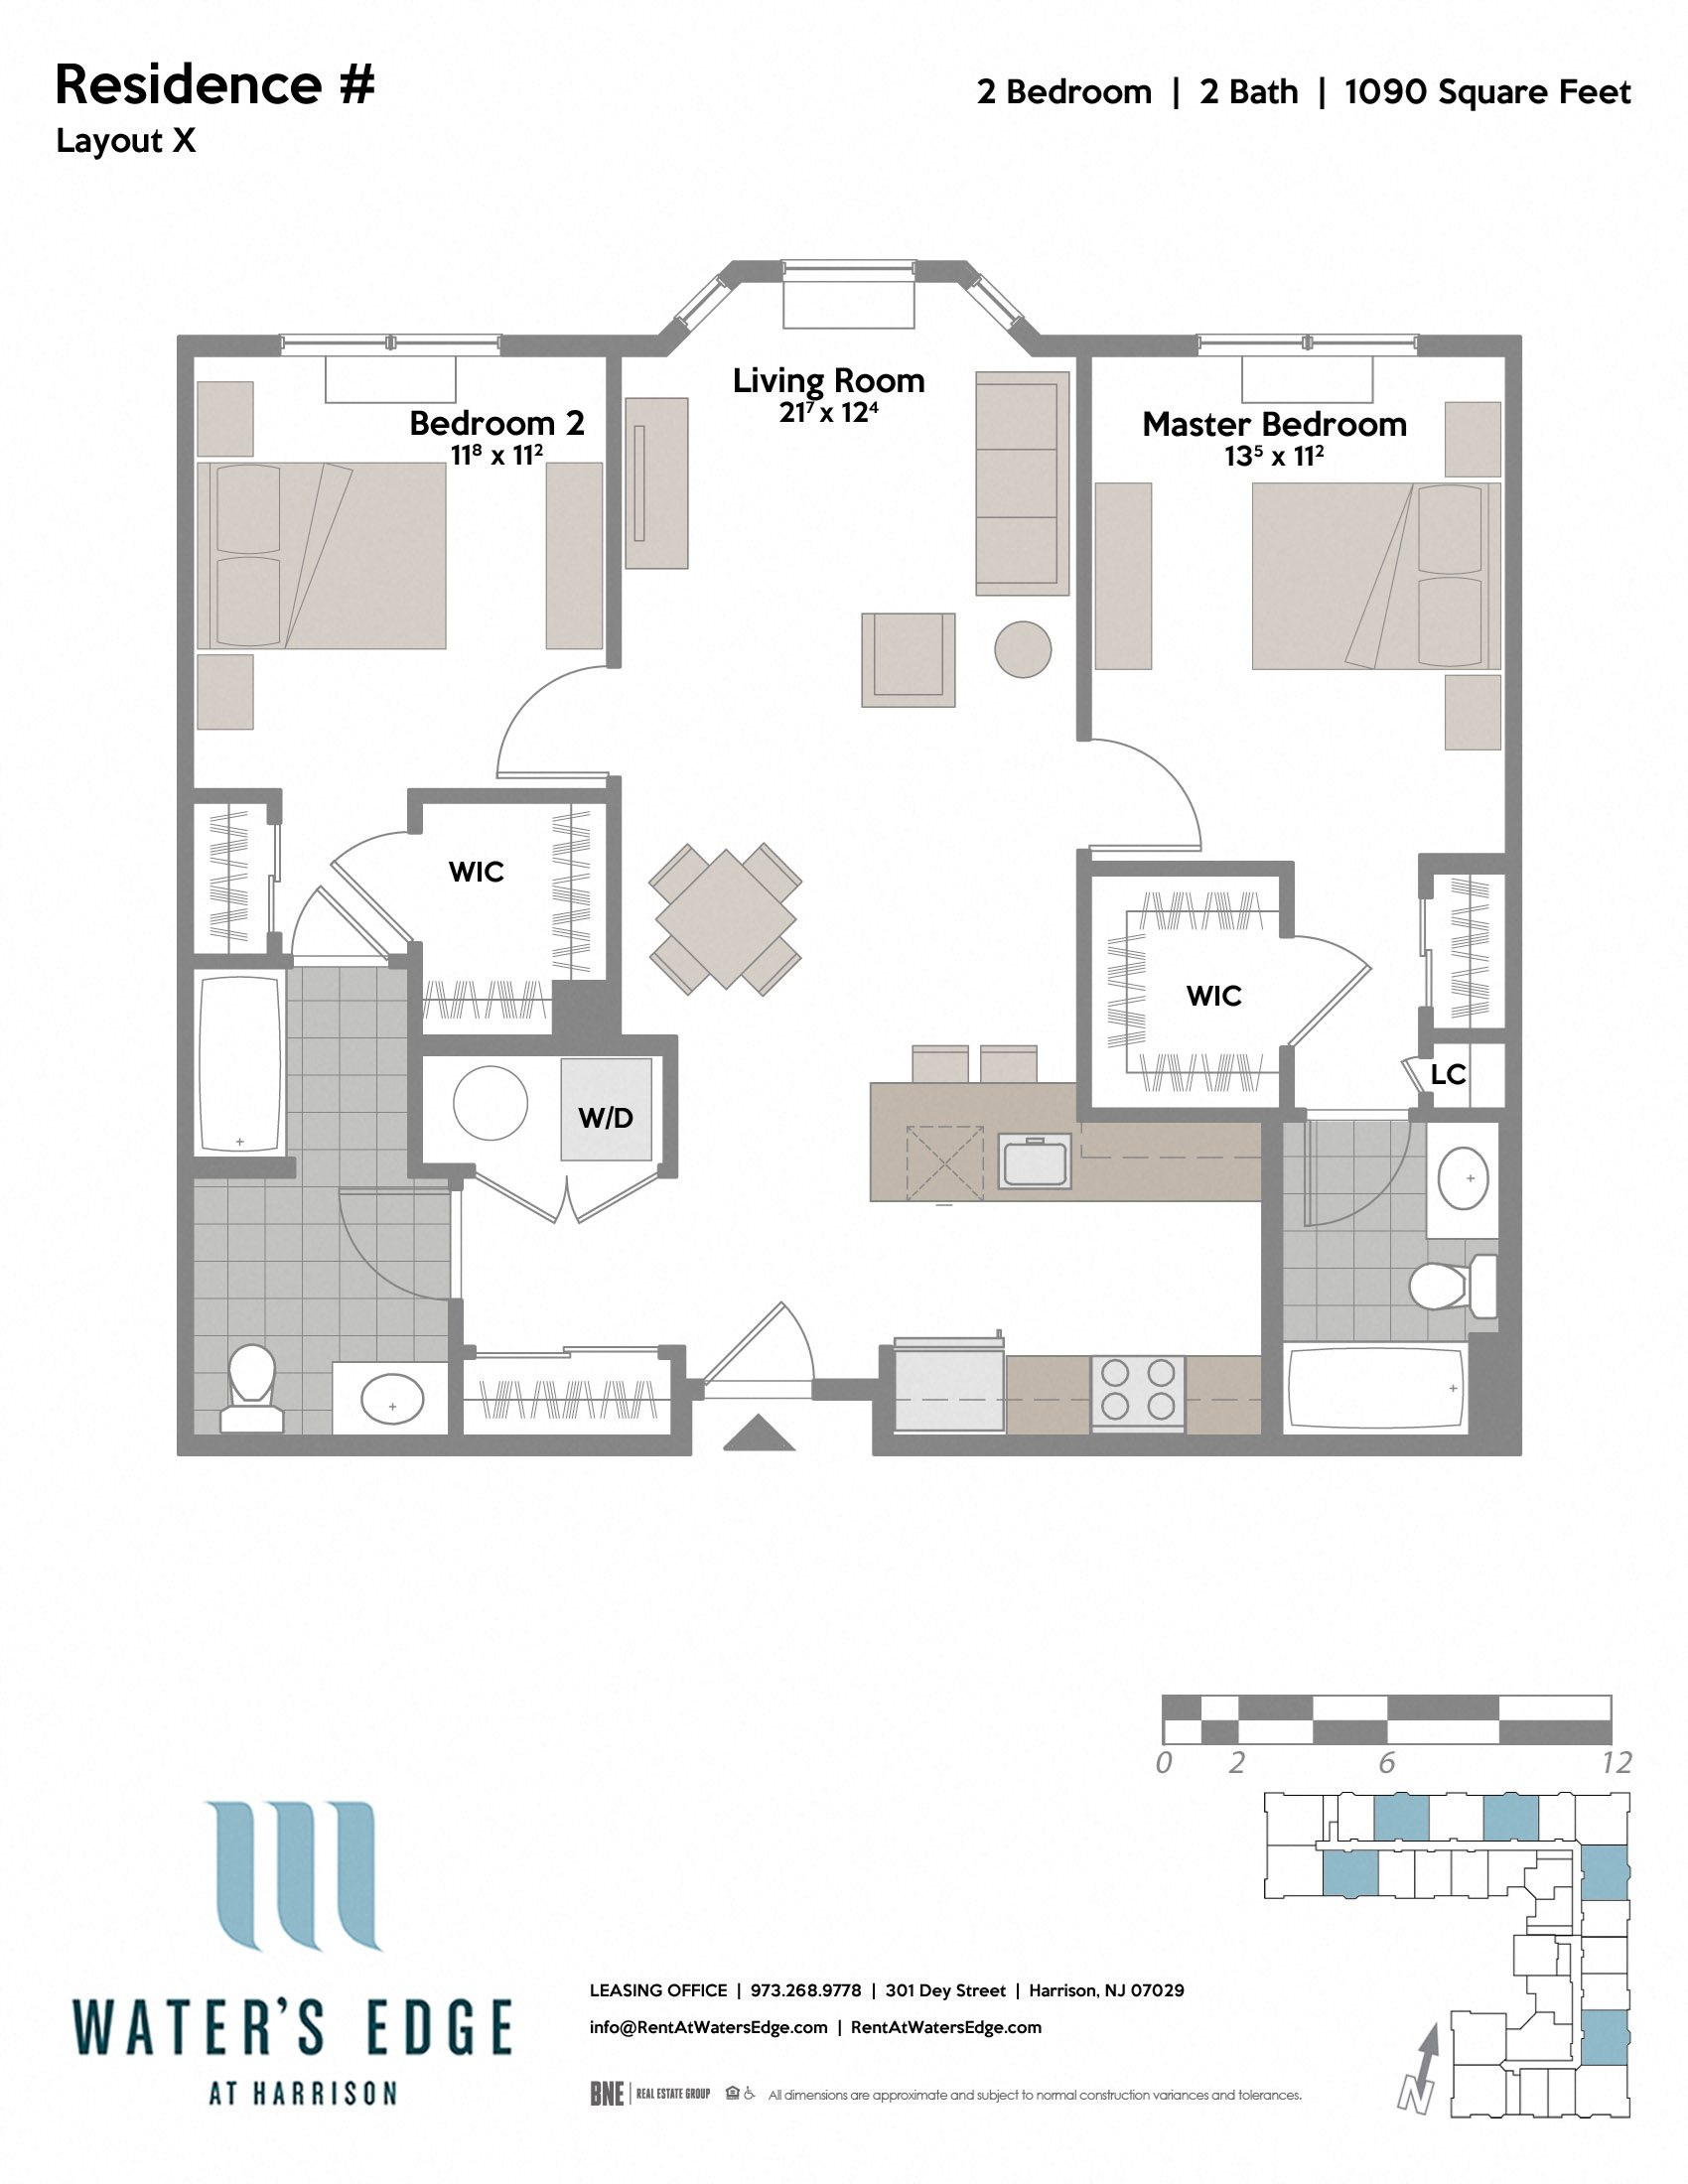 Layout X Floor Plan 4